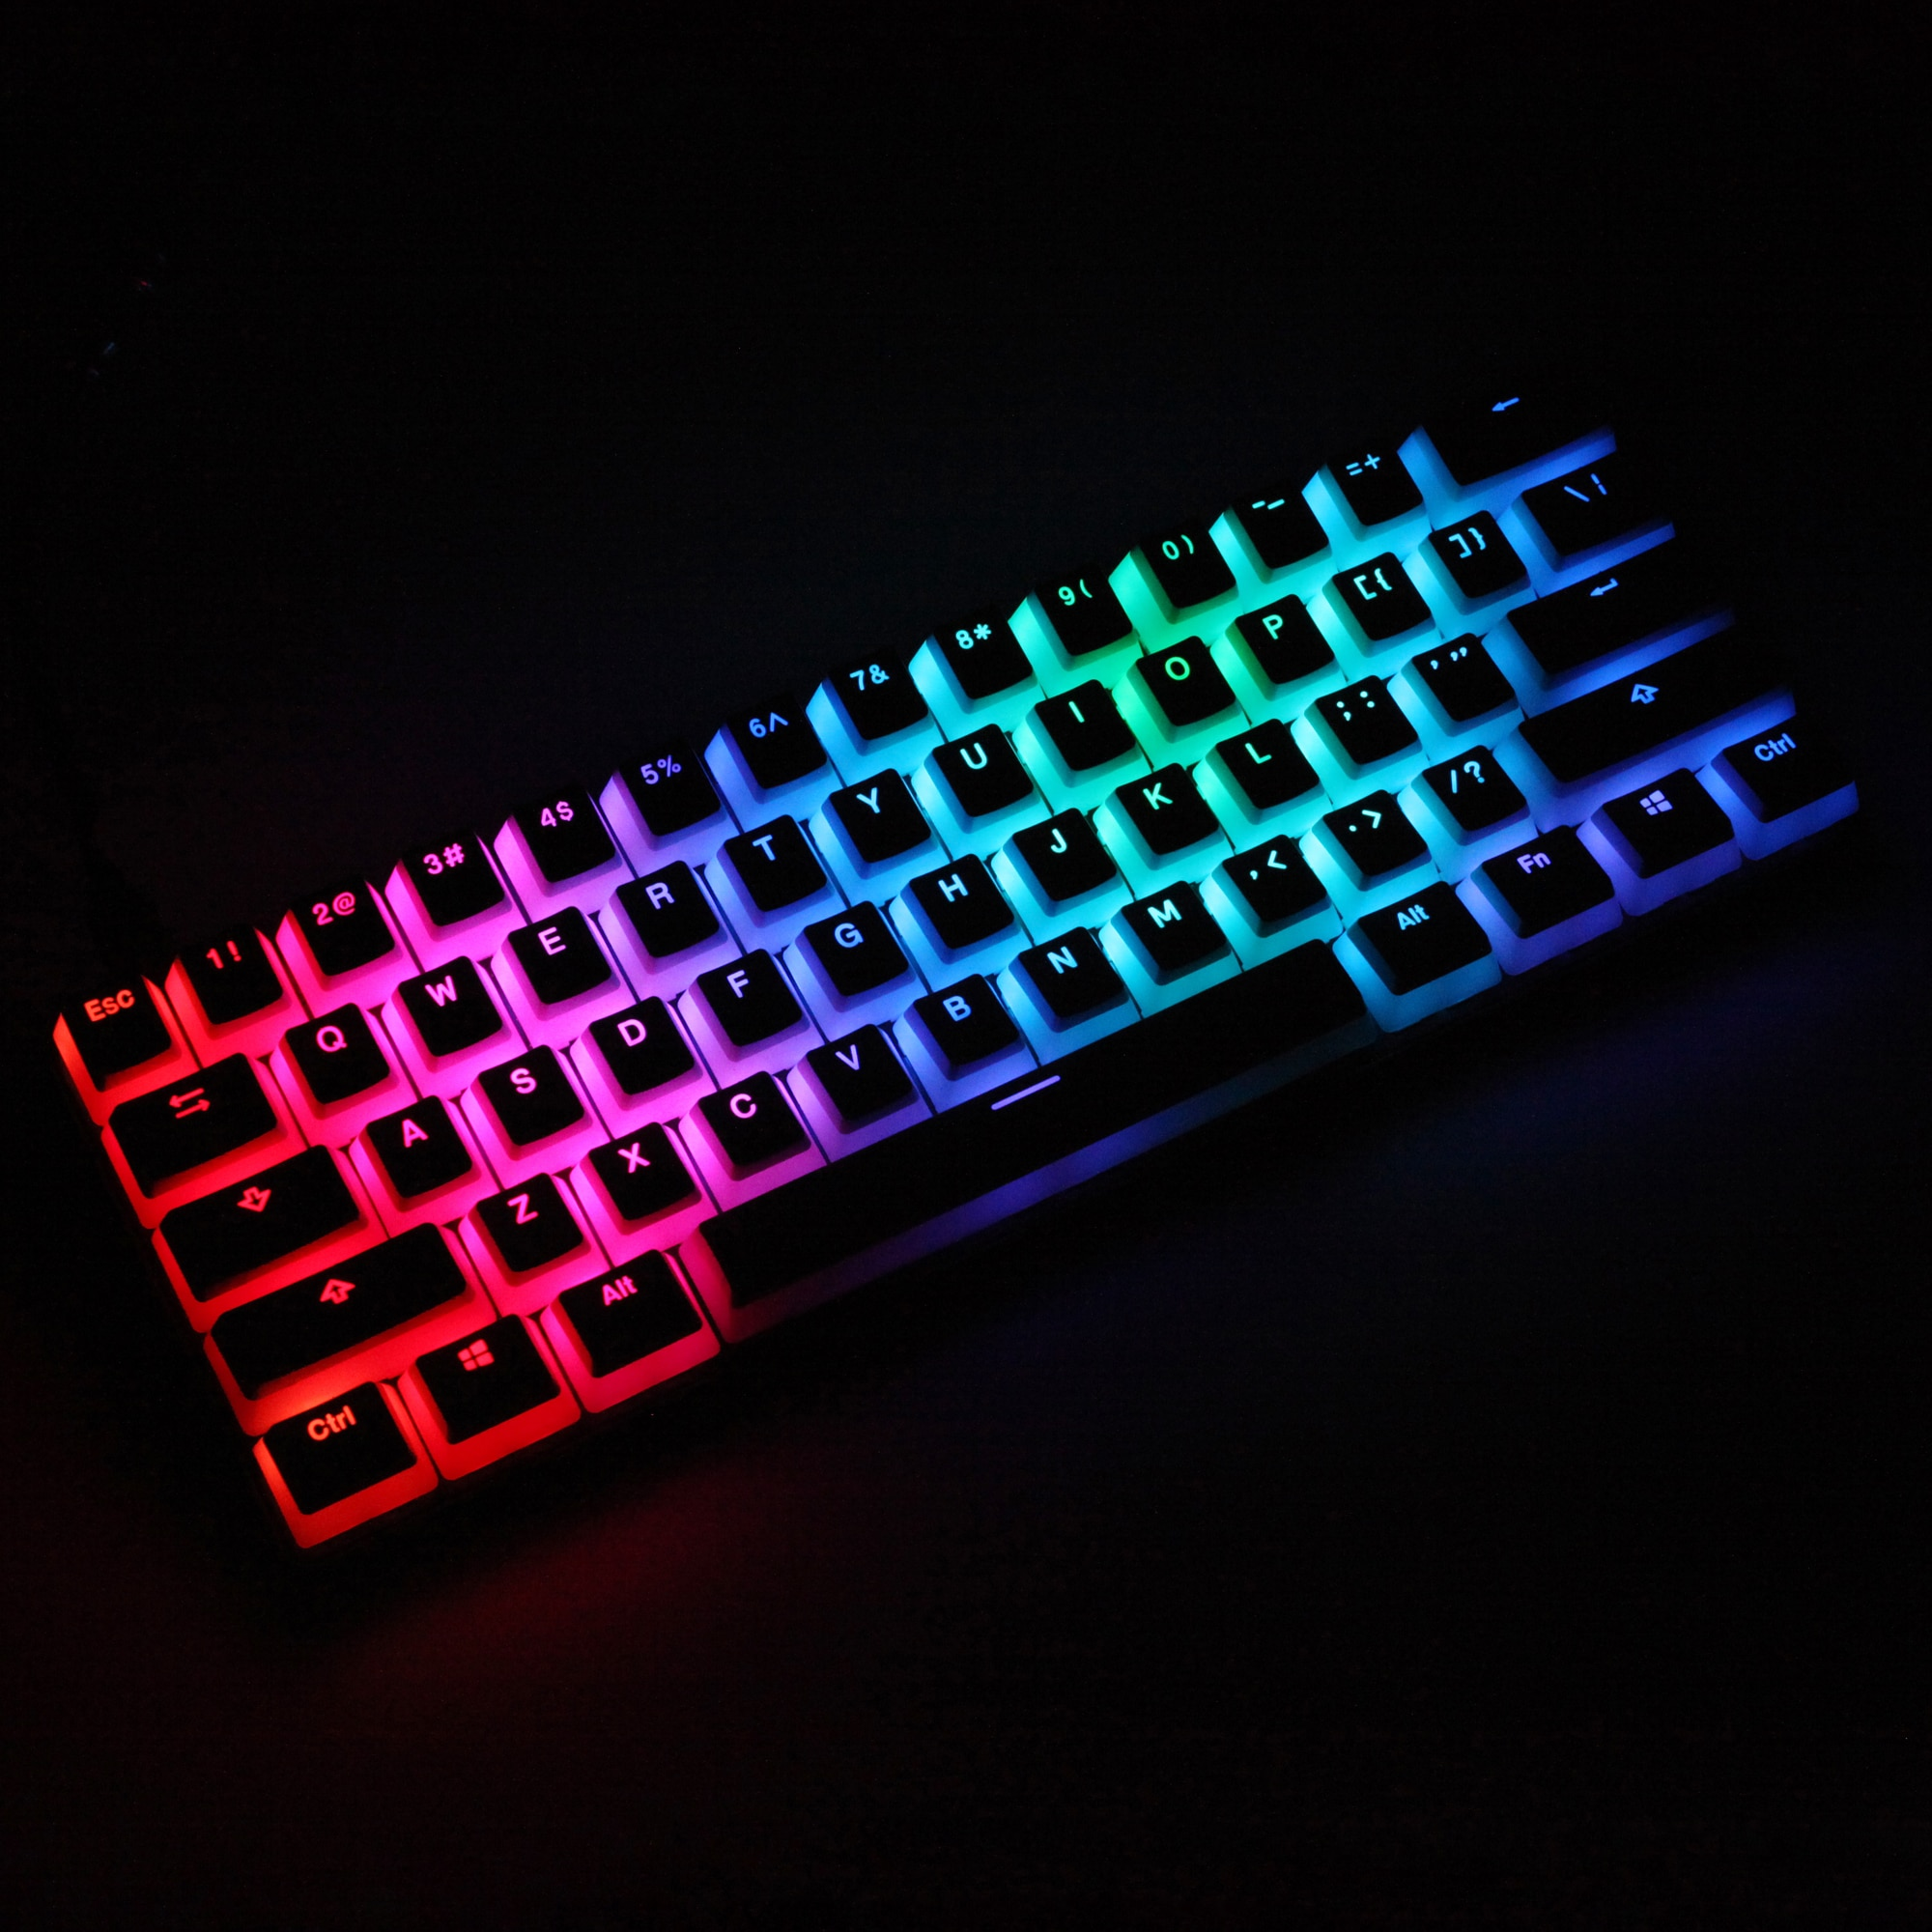 Pudding-لوحة مفاتيح ميكانيكية pbt V2 ، مع إضاءة خلفية مزدوجة ، oem ، للوحة المفاتيح البيضاء gh60 poker 87 tkl 104 108 ansi iso xd64 xd68 bm60